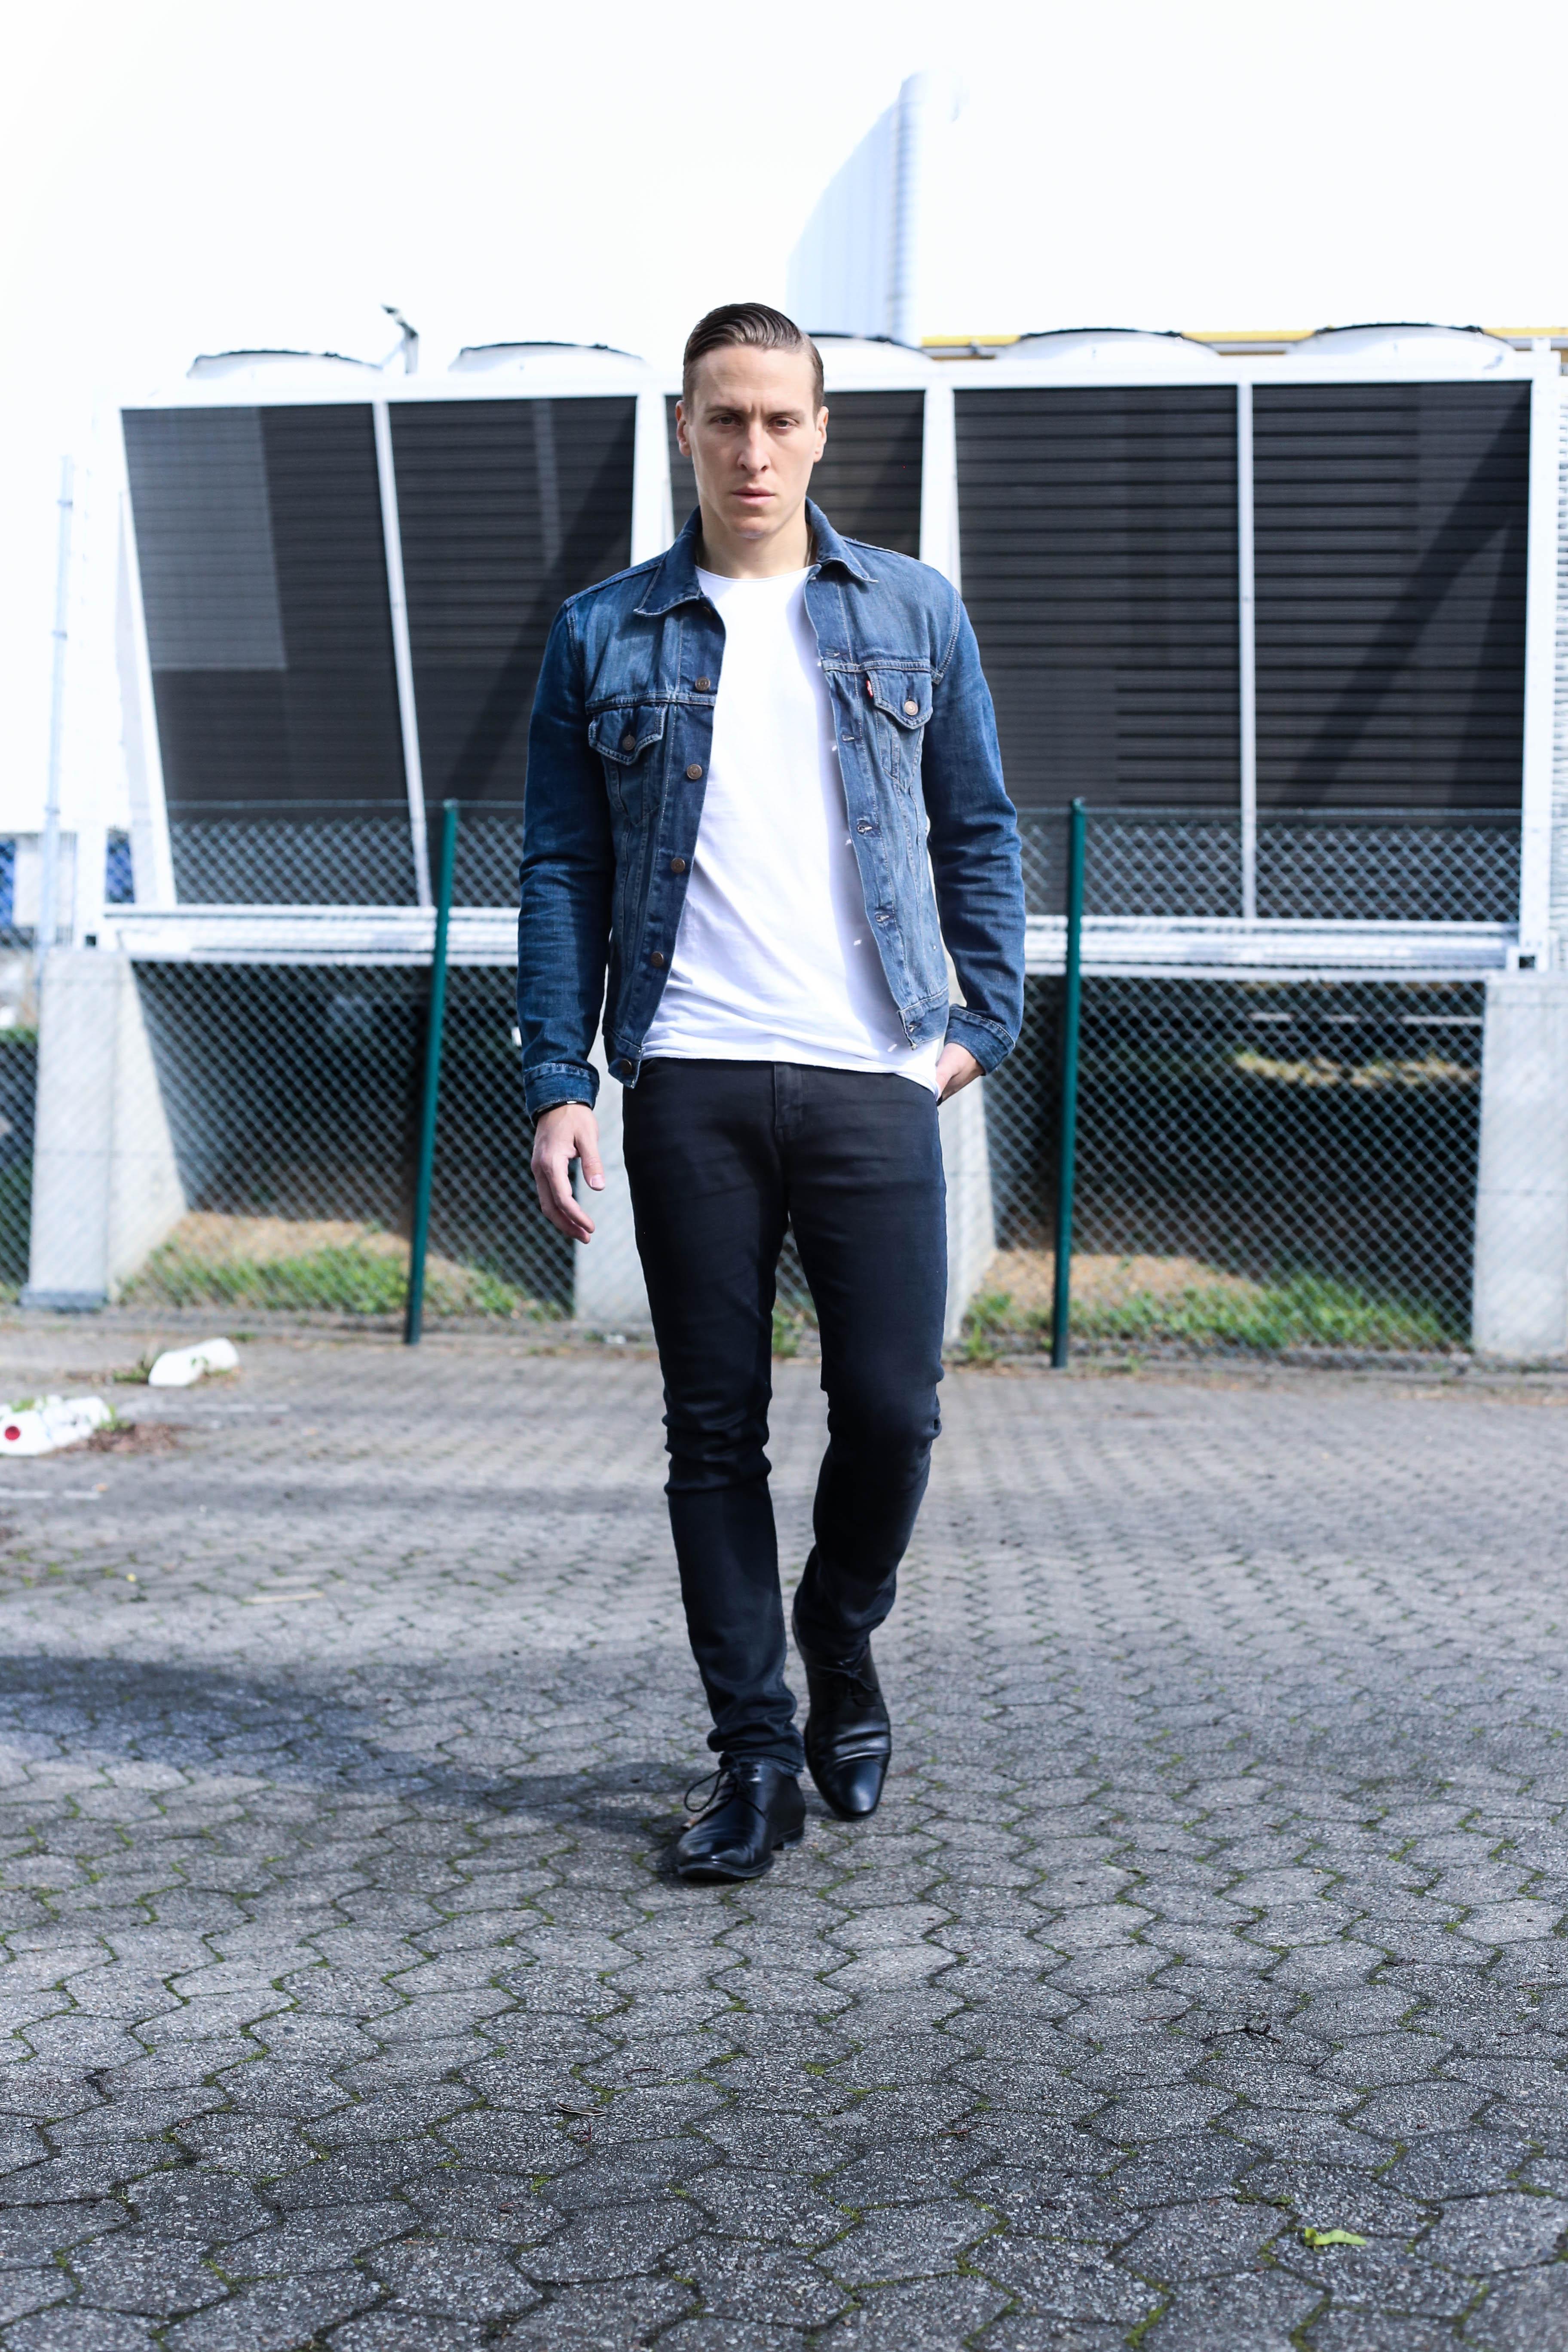 Jeansjacke-menfashion-fashionblogger-cologne-köln-outfit